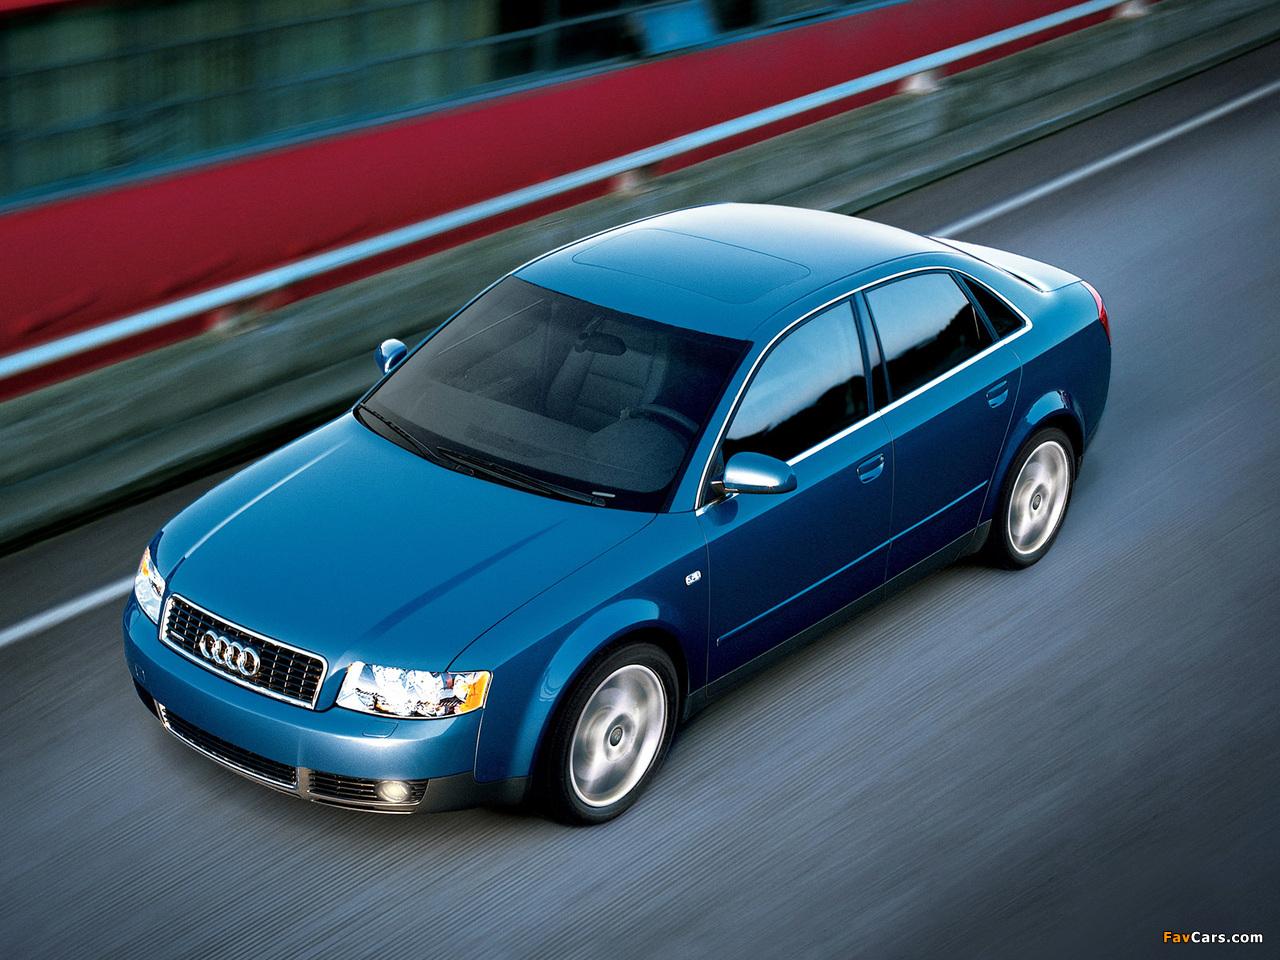 Audi A4 Sedan Us Spec B6 8e 2000 2004 Wallpapers 1280x960